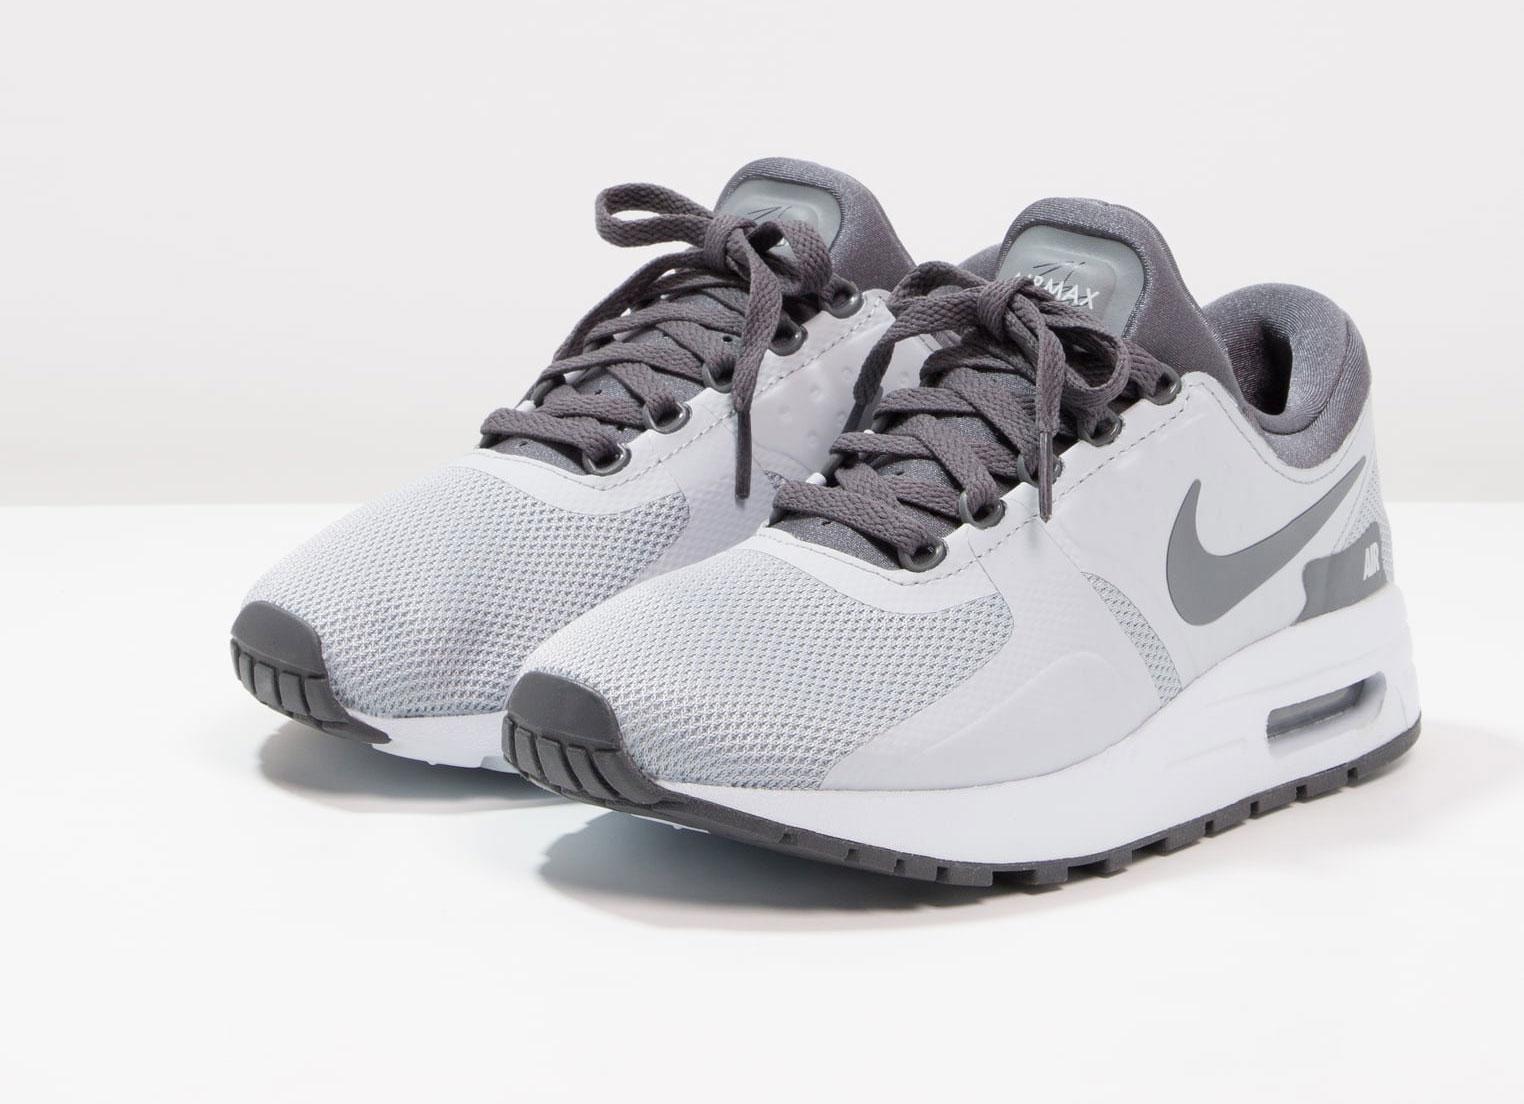 Nike Air Max Essential kids (35,5 t/m 40) -60% = €41,95 @ Zalando